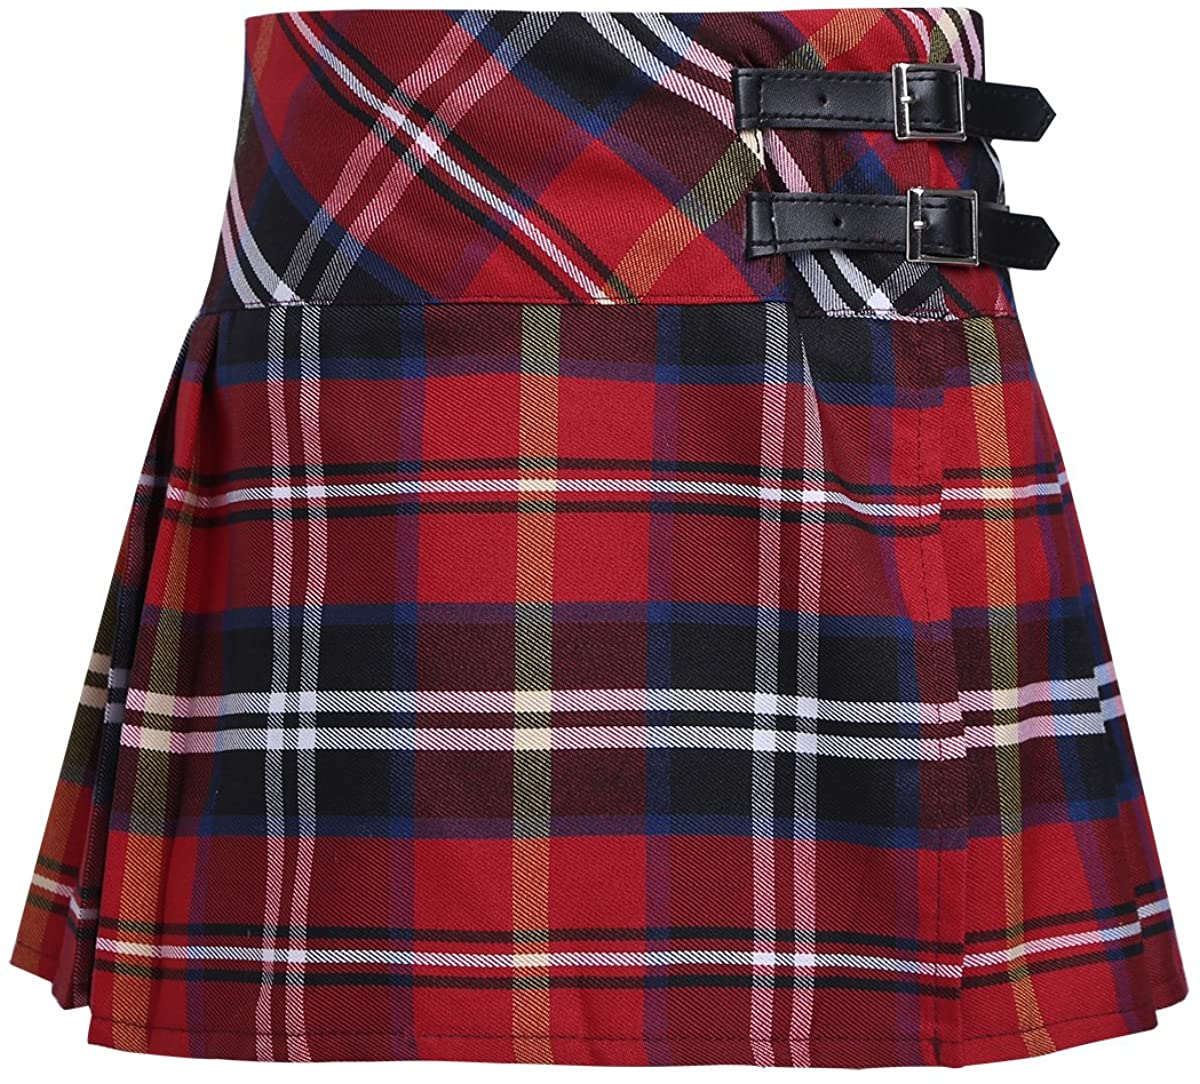 YONGHS Kids Girls Scotland Plaid School Uniform Pleated Side Split Mini Skirt Casual Daily Wear